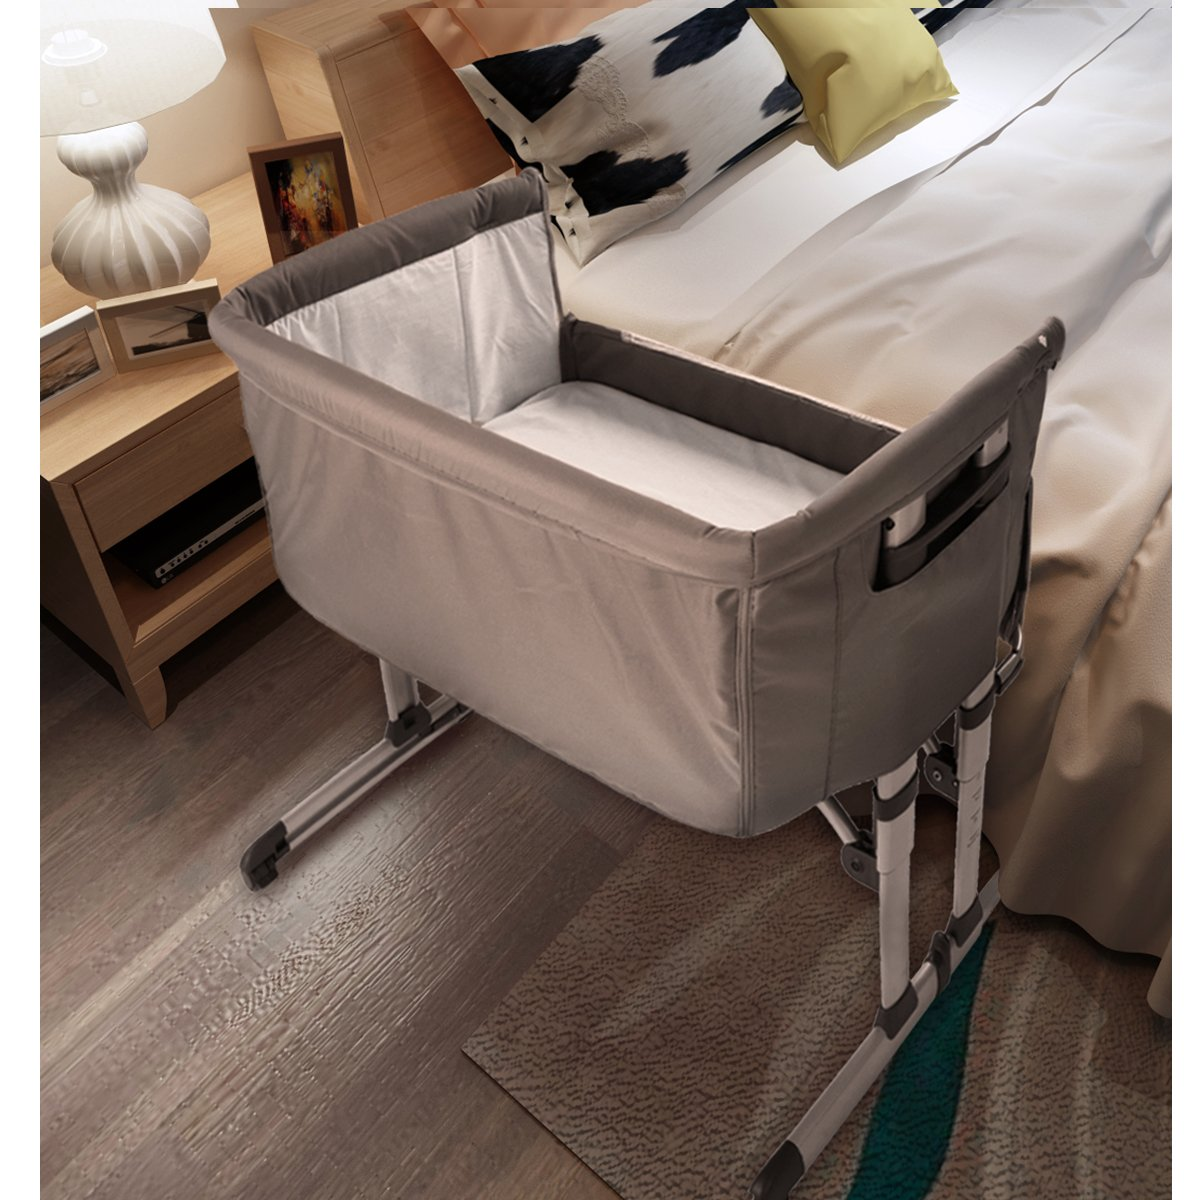 Baby Travel Cot Sleeper Bedside Co Sleeping Crib Bed Bedding Bassinet Folding Adjustable Portable with Matress (Pink) Wellgarden